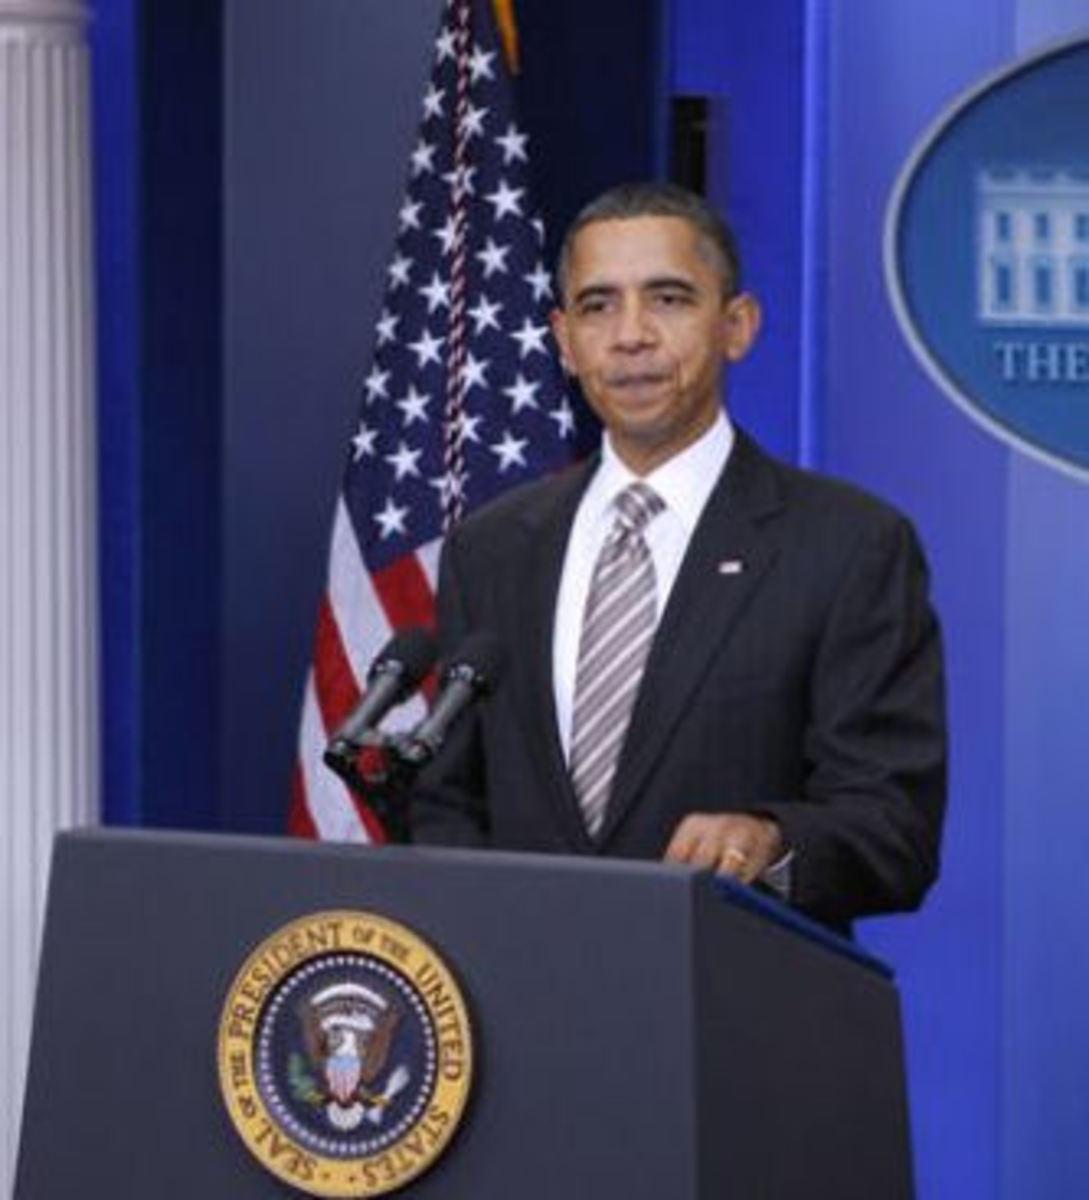 Obama's General Motors [GM] Tarp Bailout - The Untold Details